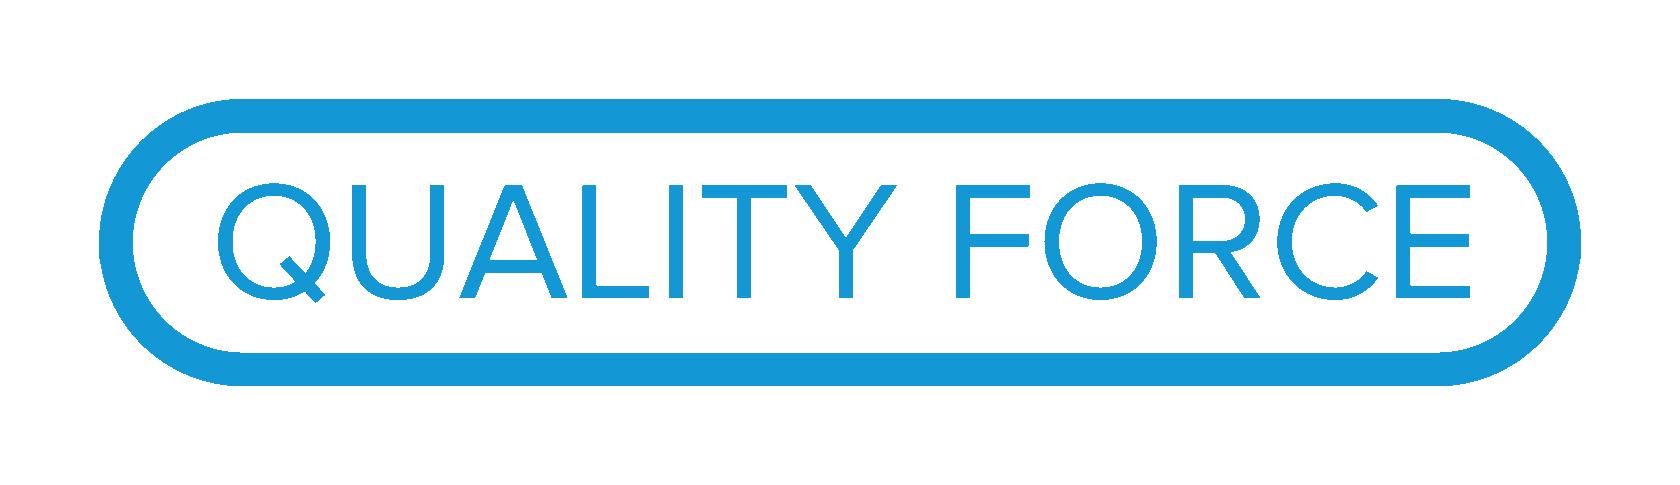 QUALITY FORCE